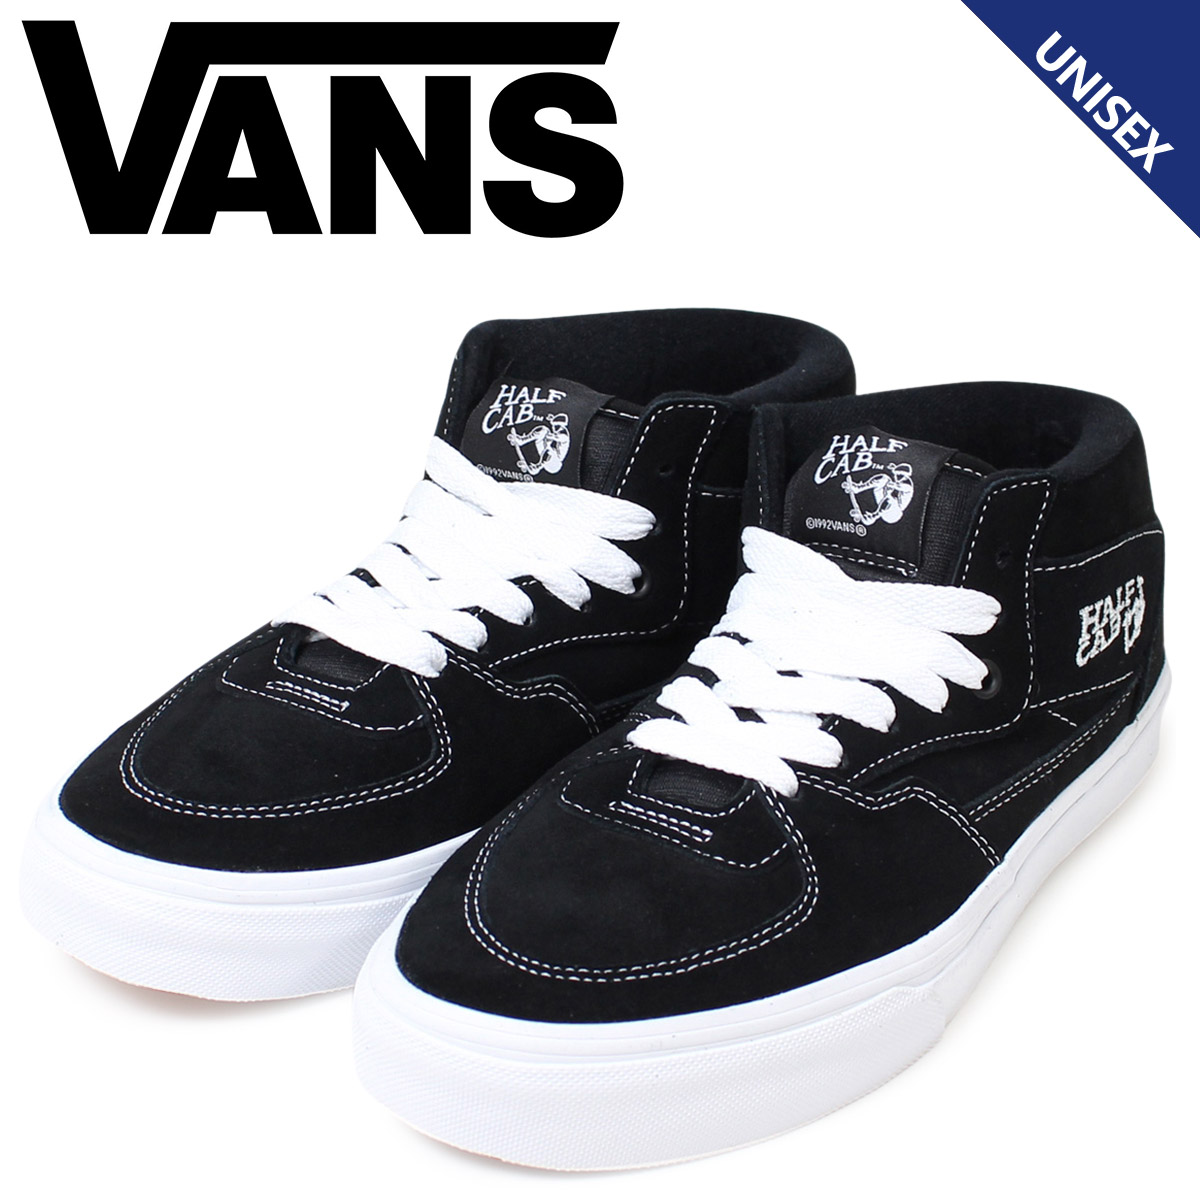 5bcfa13e43 VANS HALF CAB sneakers men gap Dis vans station wagons half cab VN000DZ3BLK shoes  black  the 1 13 additional arrival